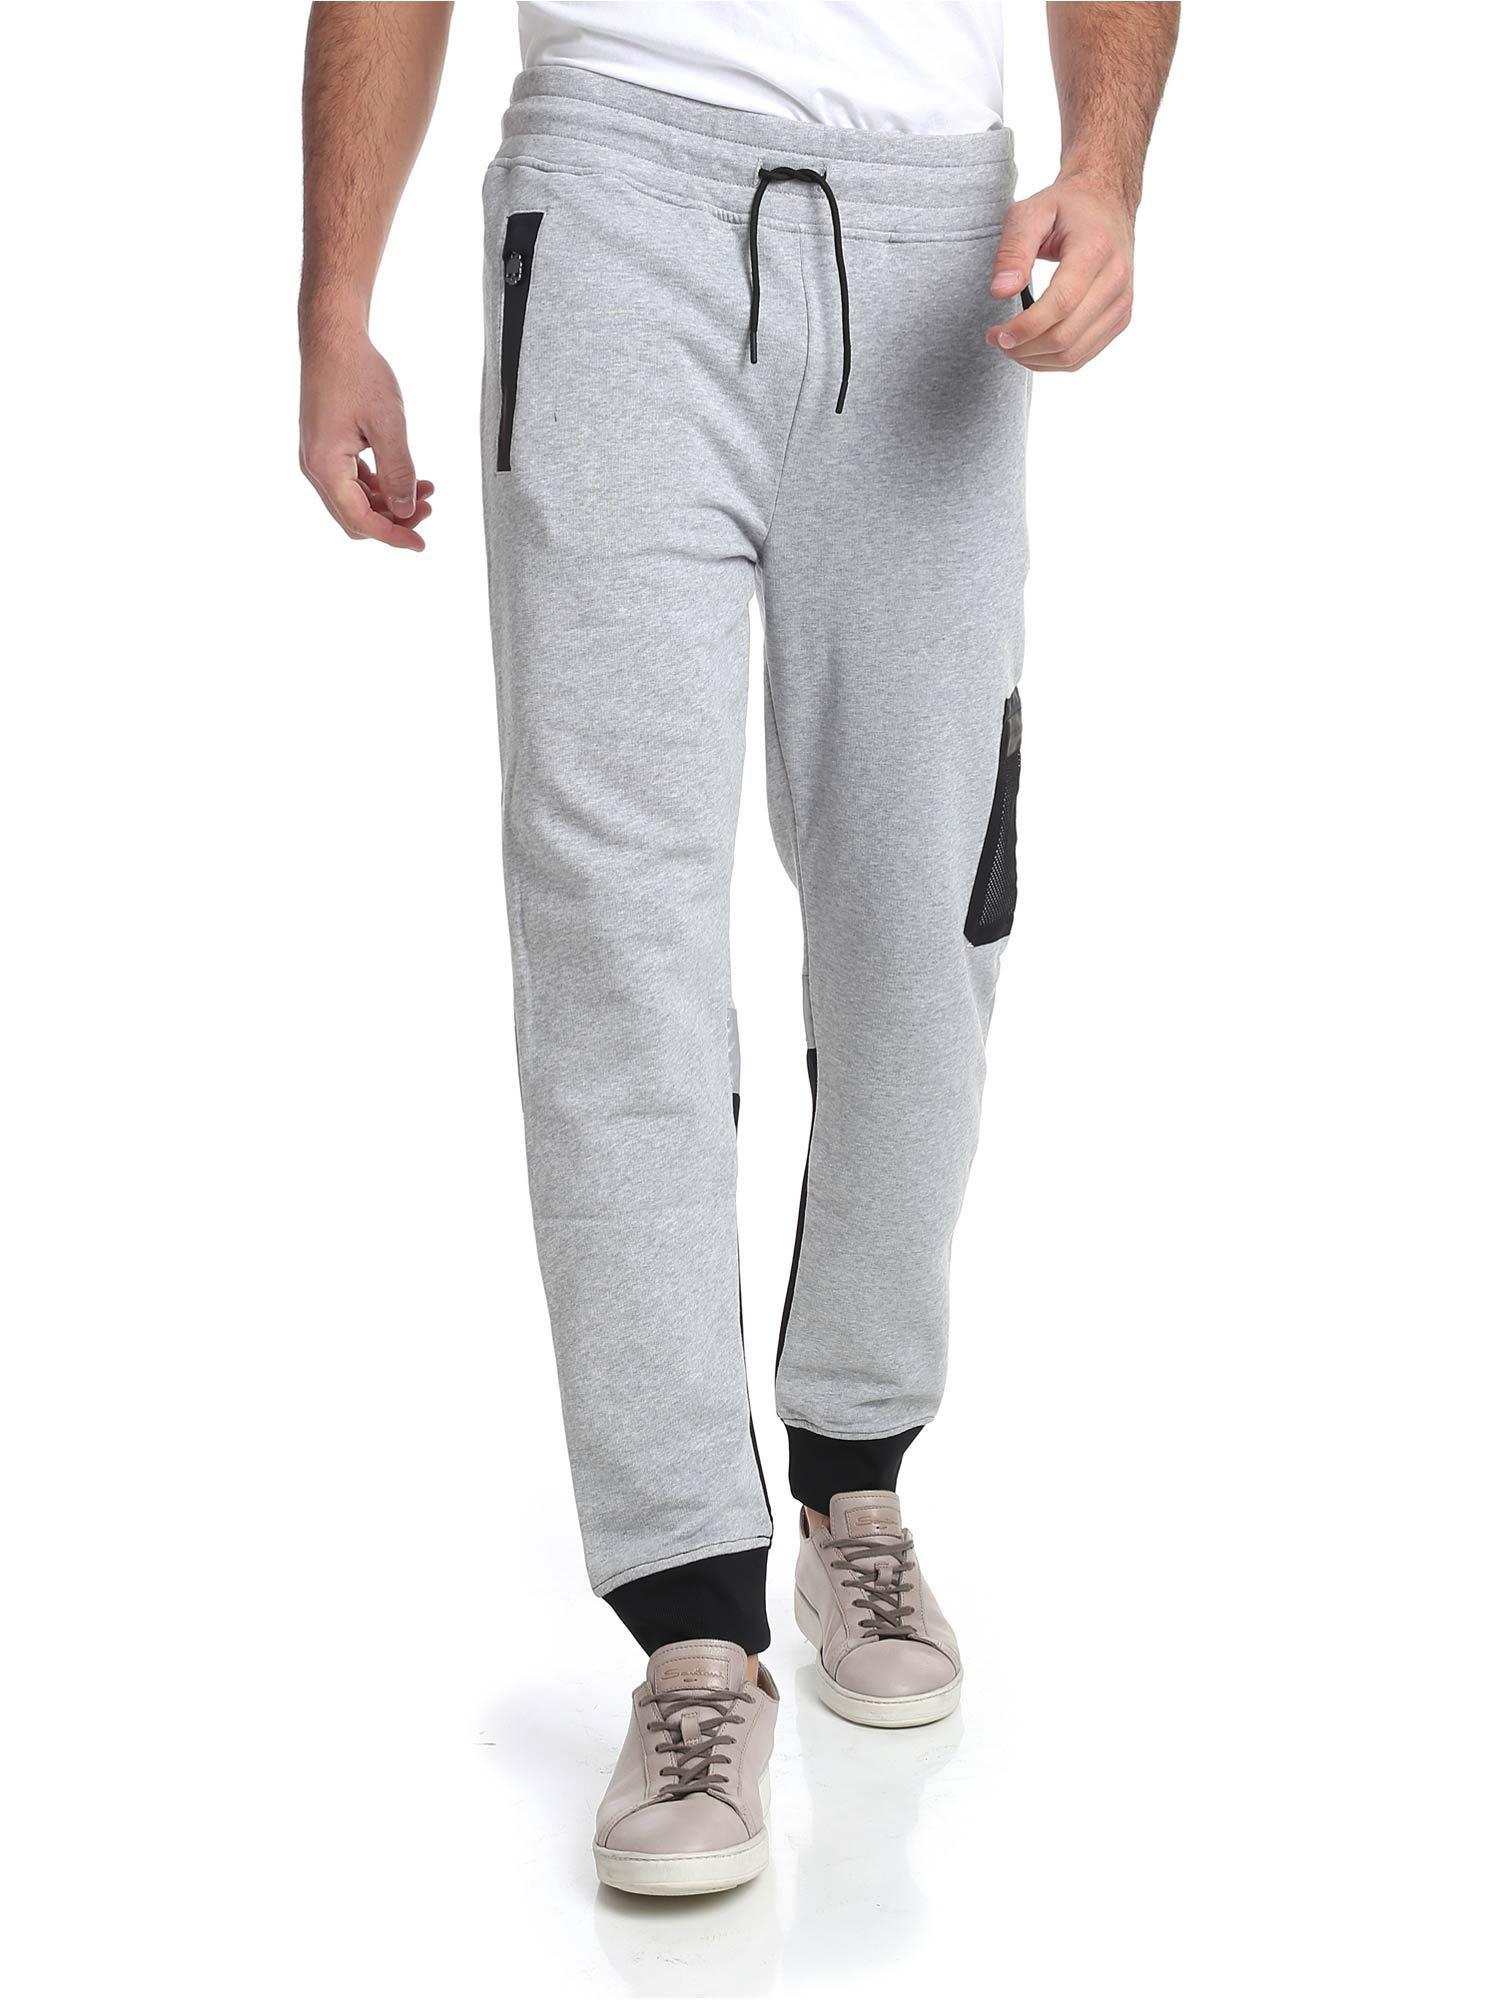 Hydrogen Reflective Print Jogging Pants